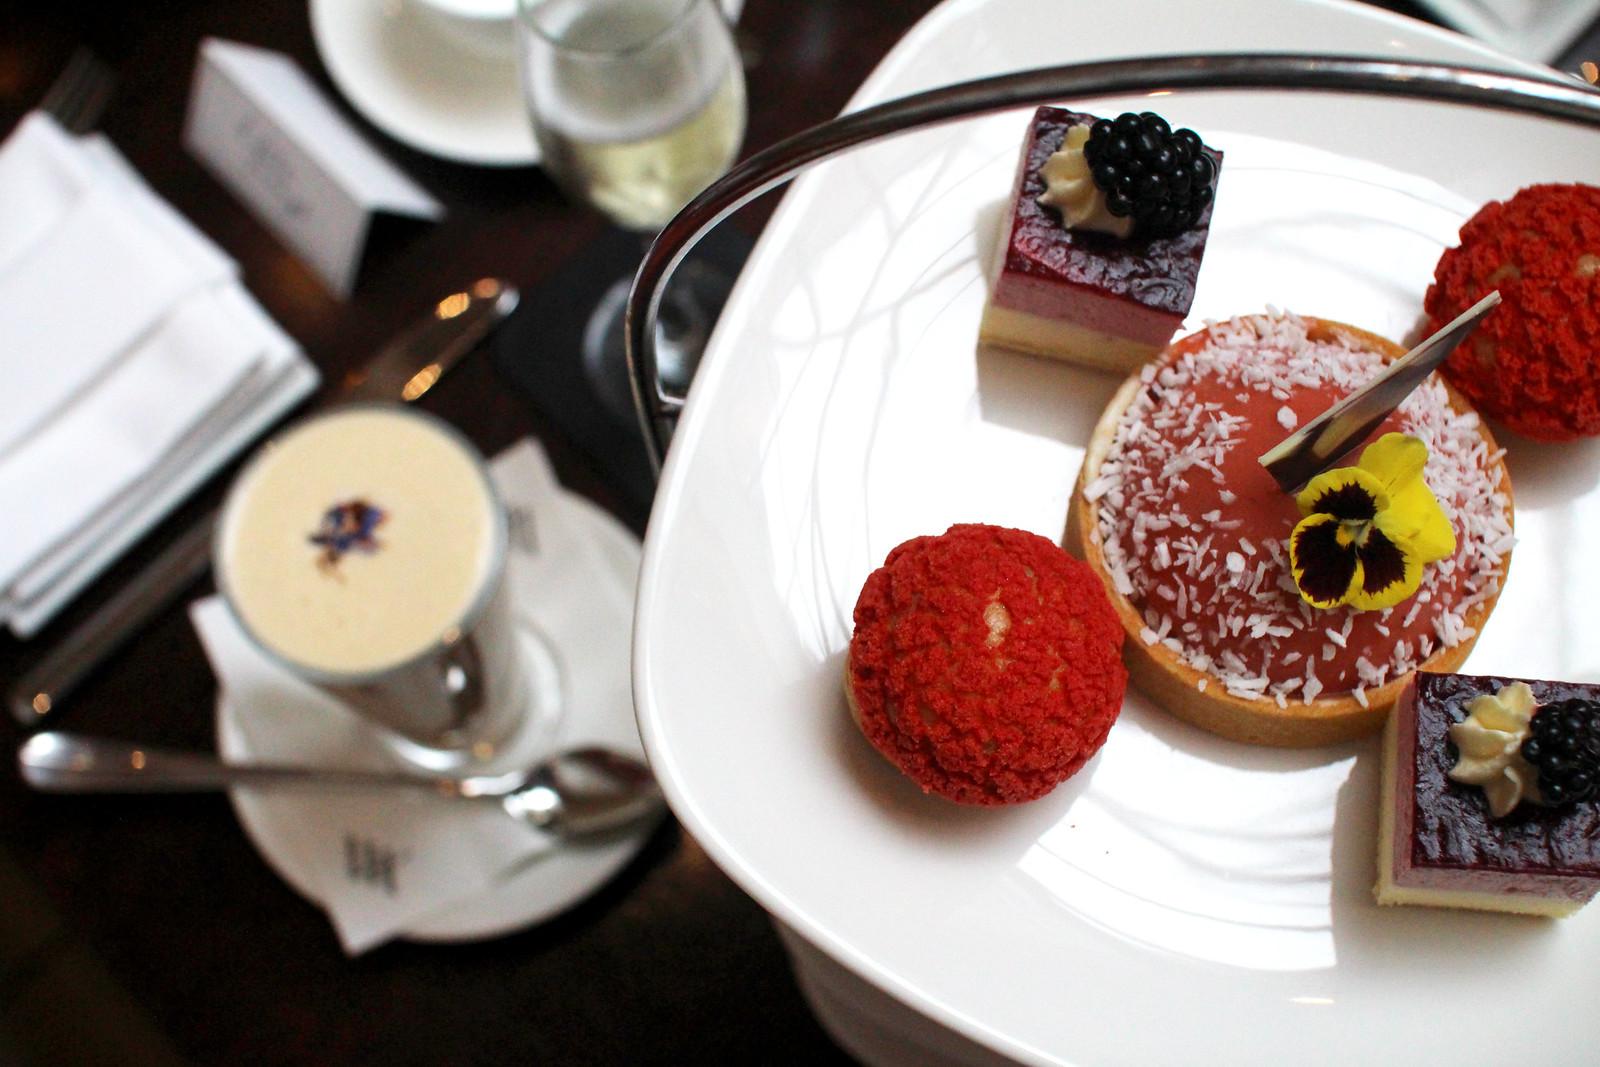 Waldorf Astoria Calton Hotel Peacock Room Afternoon Tea Summer 2017 Blogger Lifestyle Review Edinburgh UK